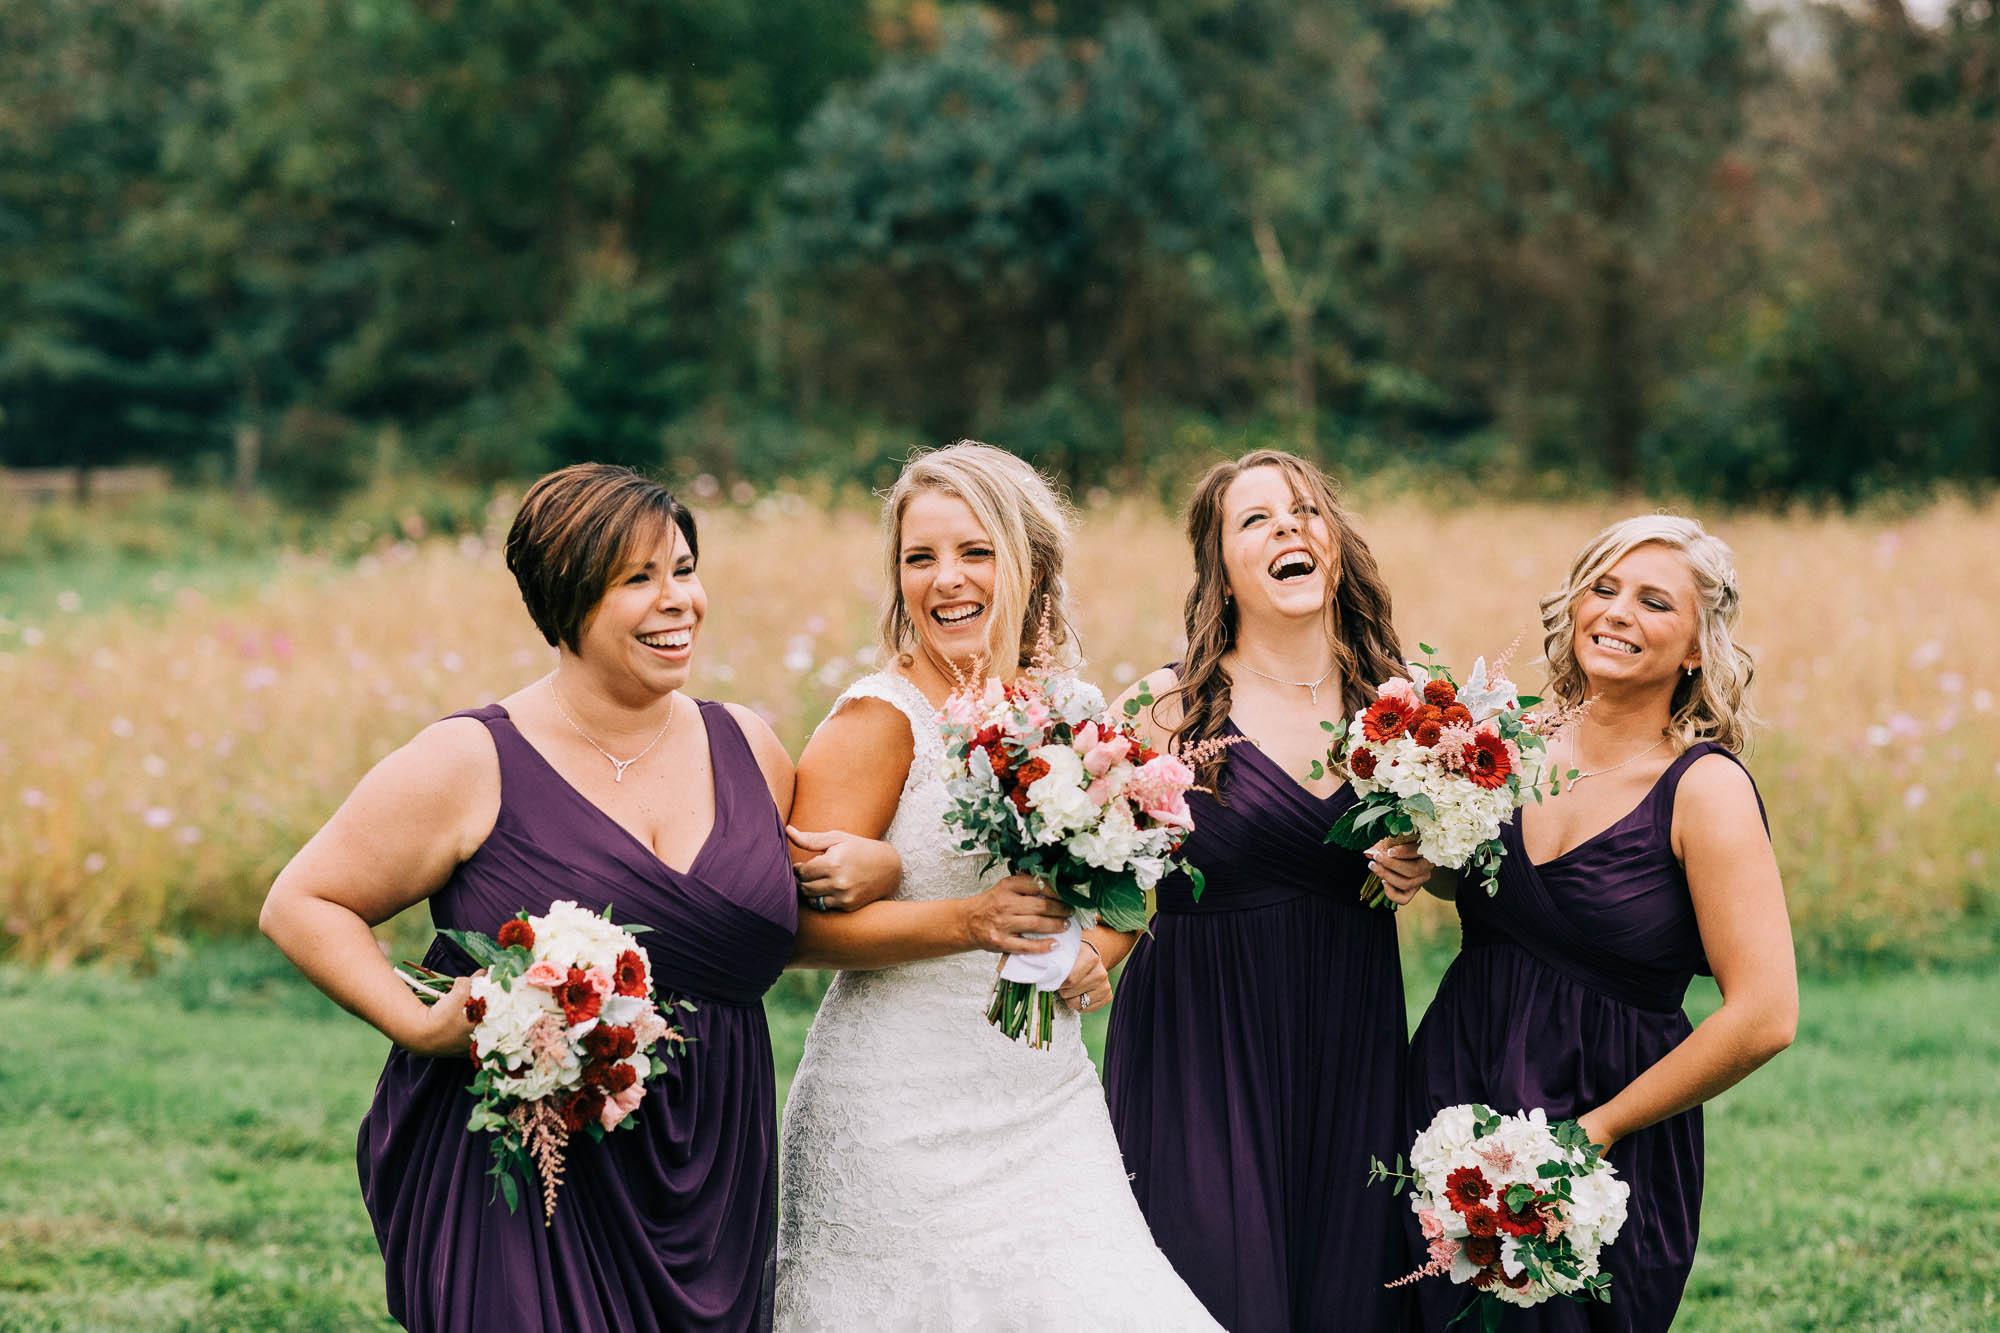 Lodge-at-Raven-Creek-October-wedding-49.jpg